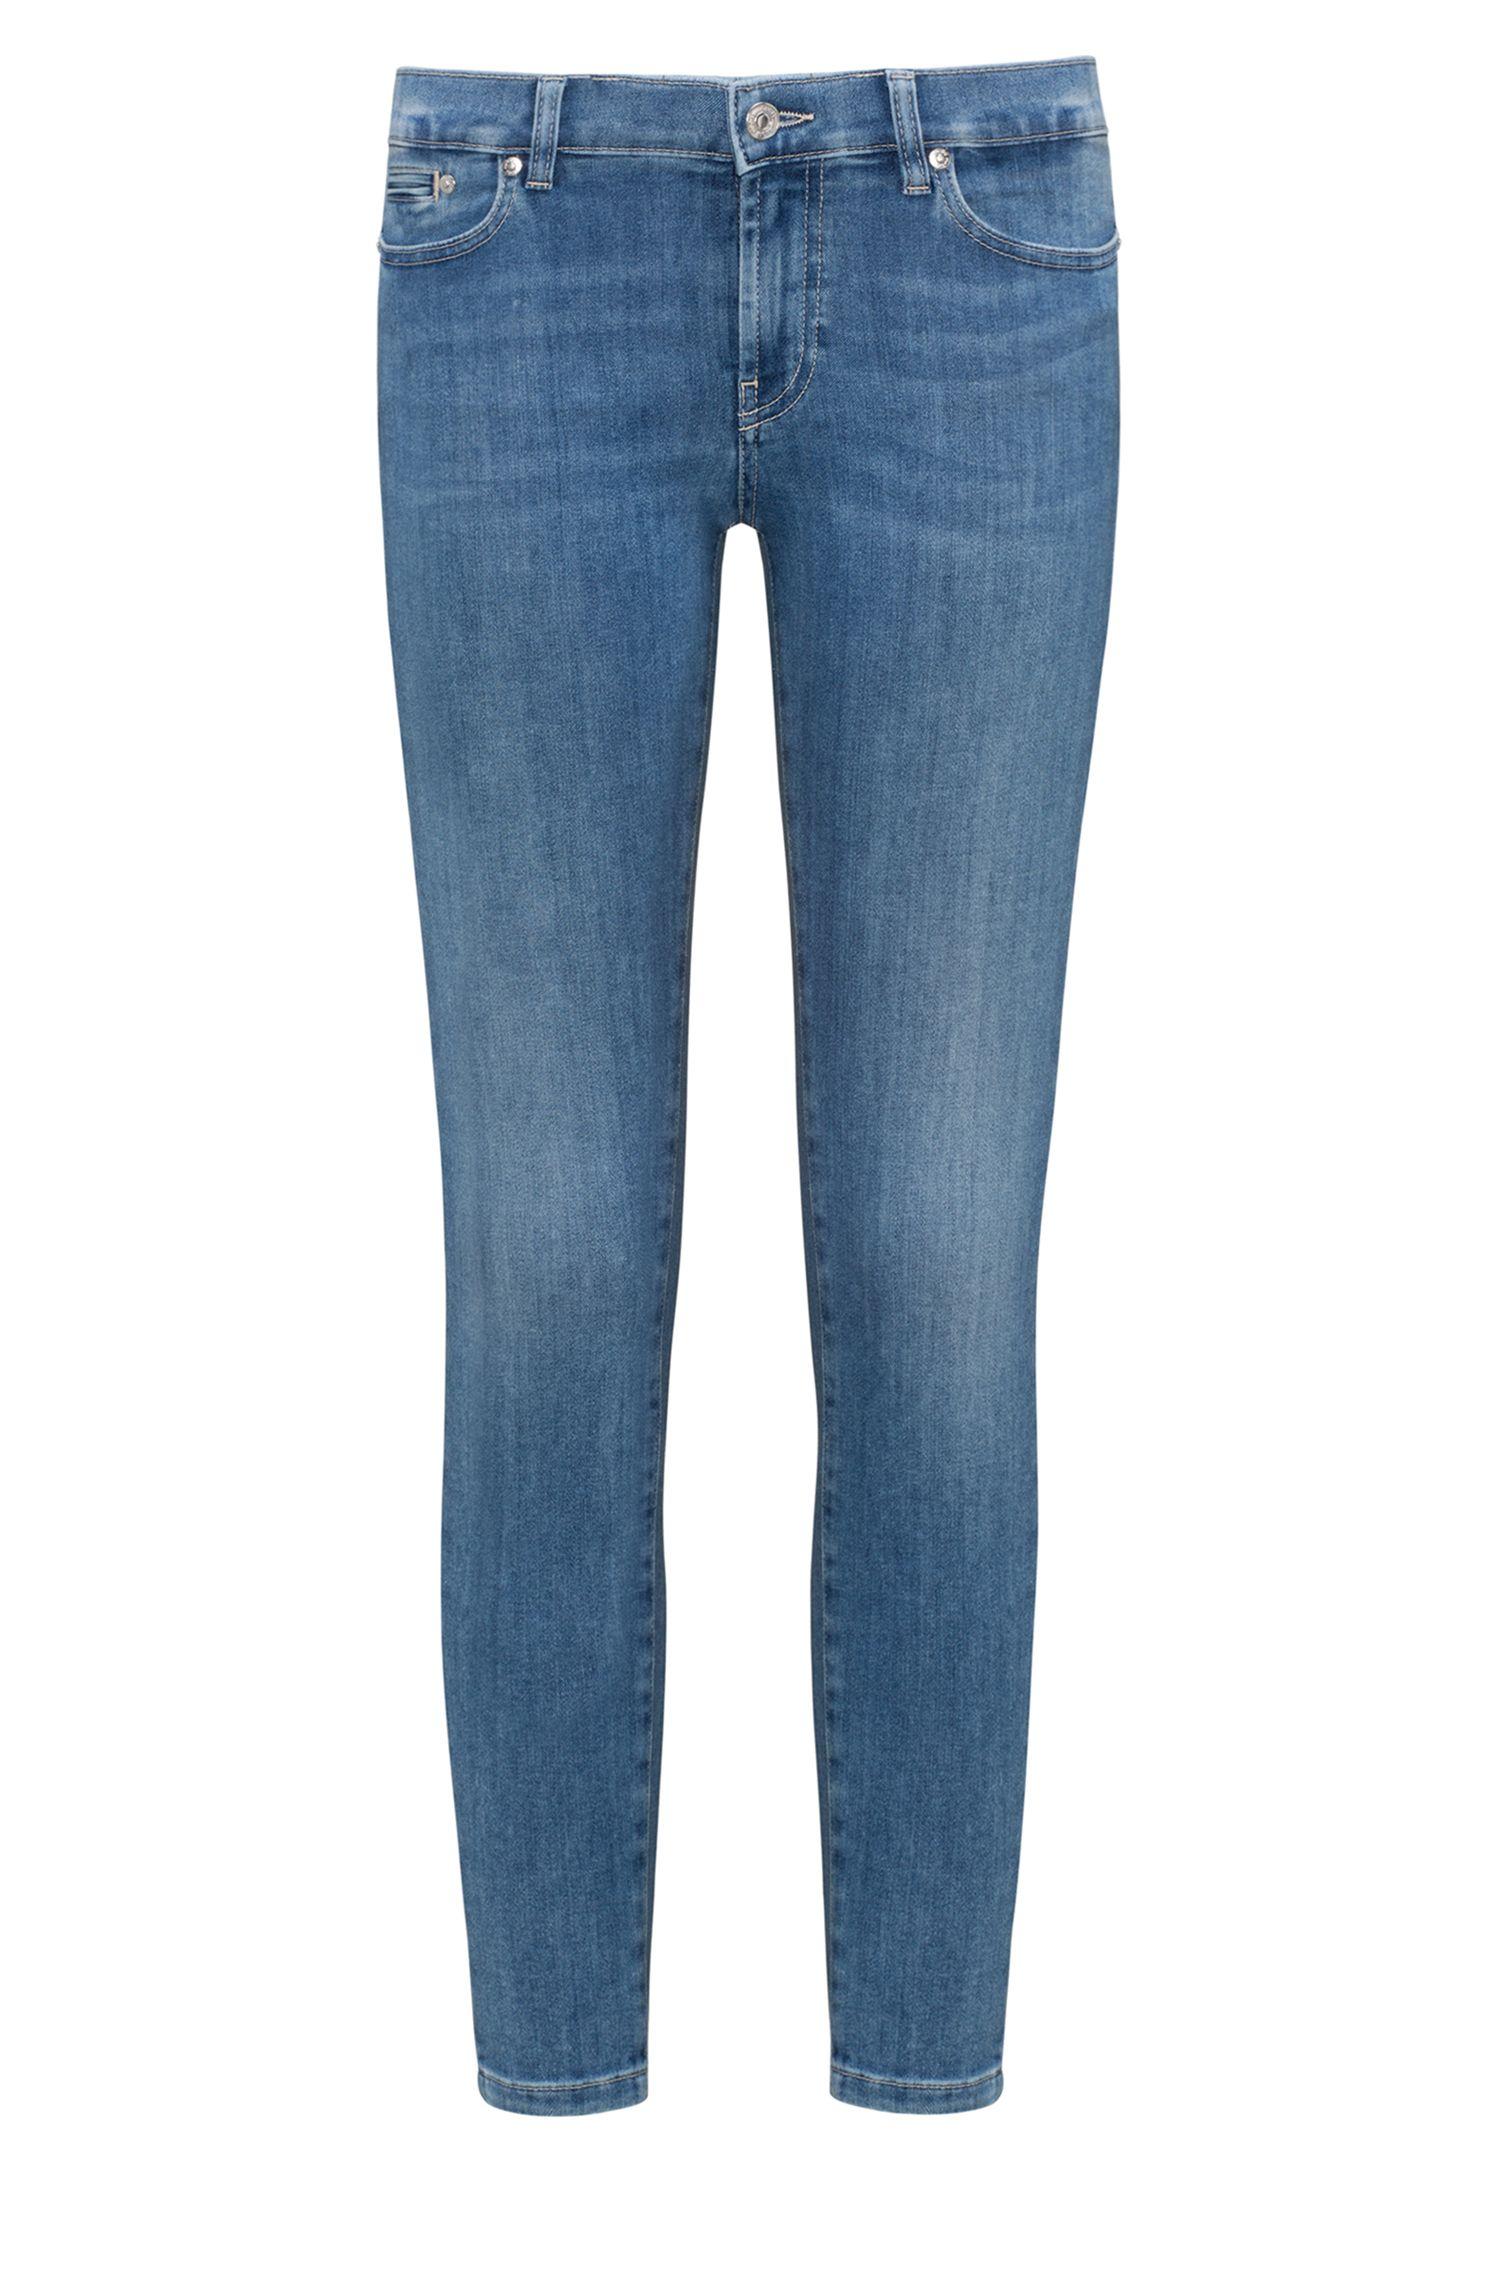 Stretch Cotton Jean, Skinny Fit | Gilljana